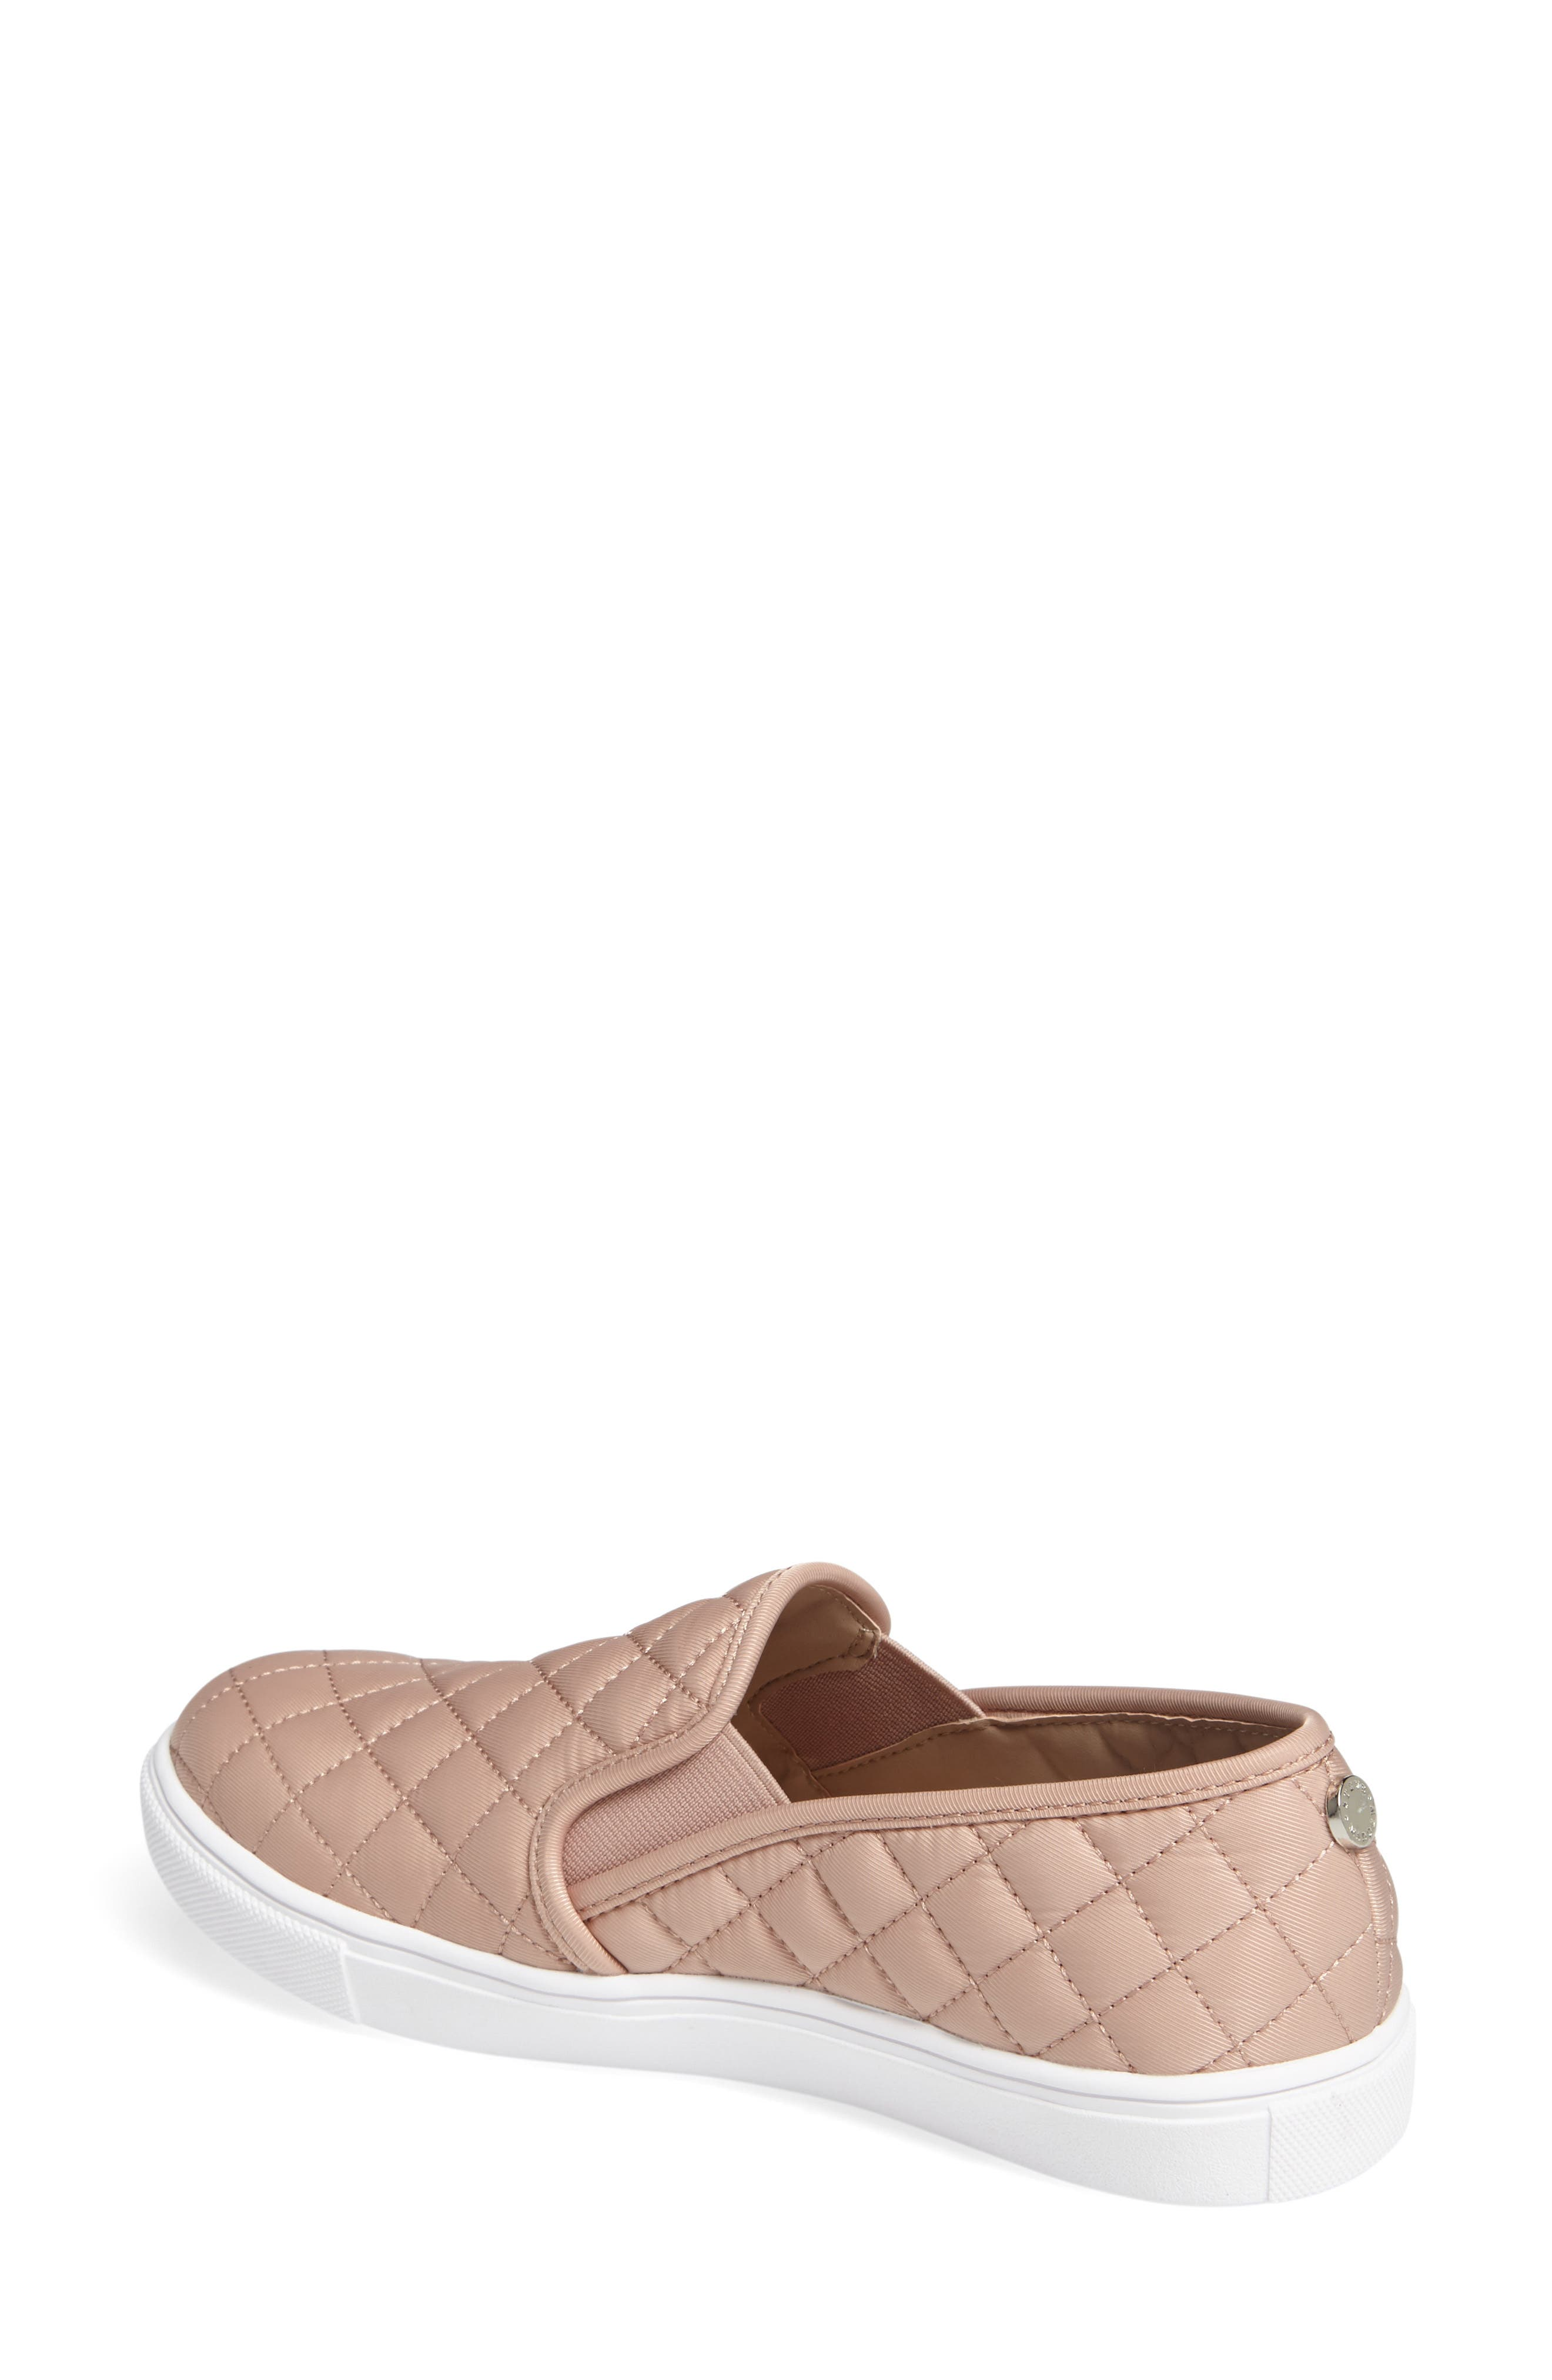 'Ecntrcqt' Sneaker,                             Alternate thumbnail 2, color,                             Blush Fabric